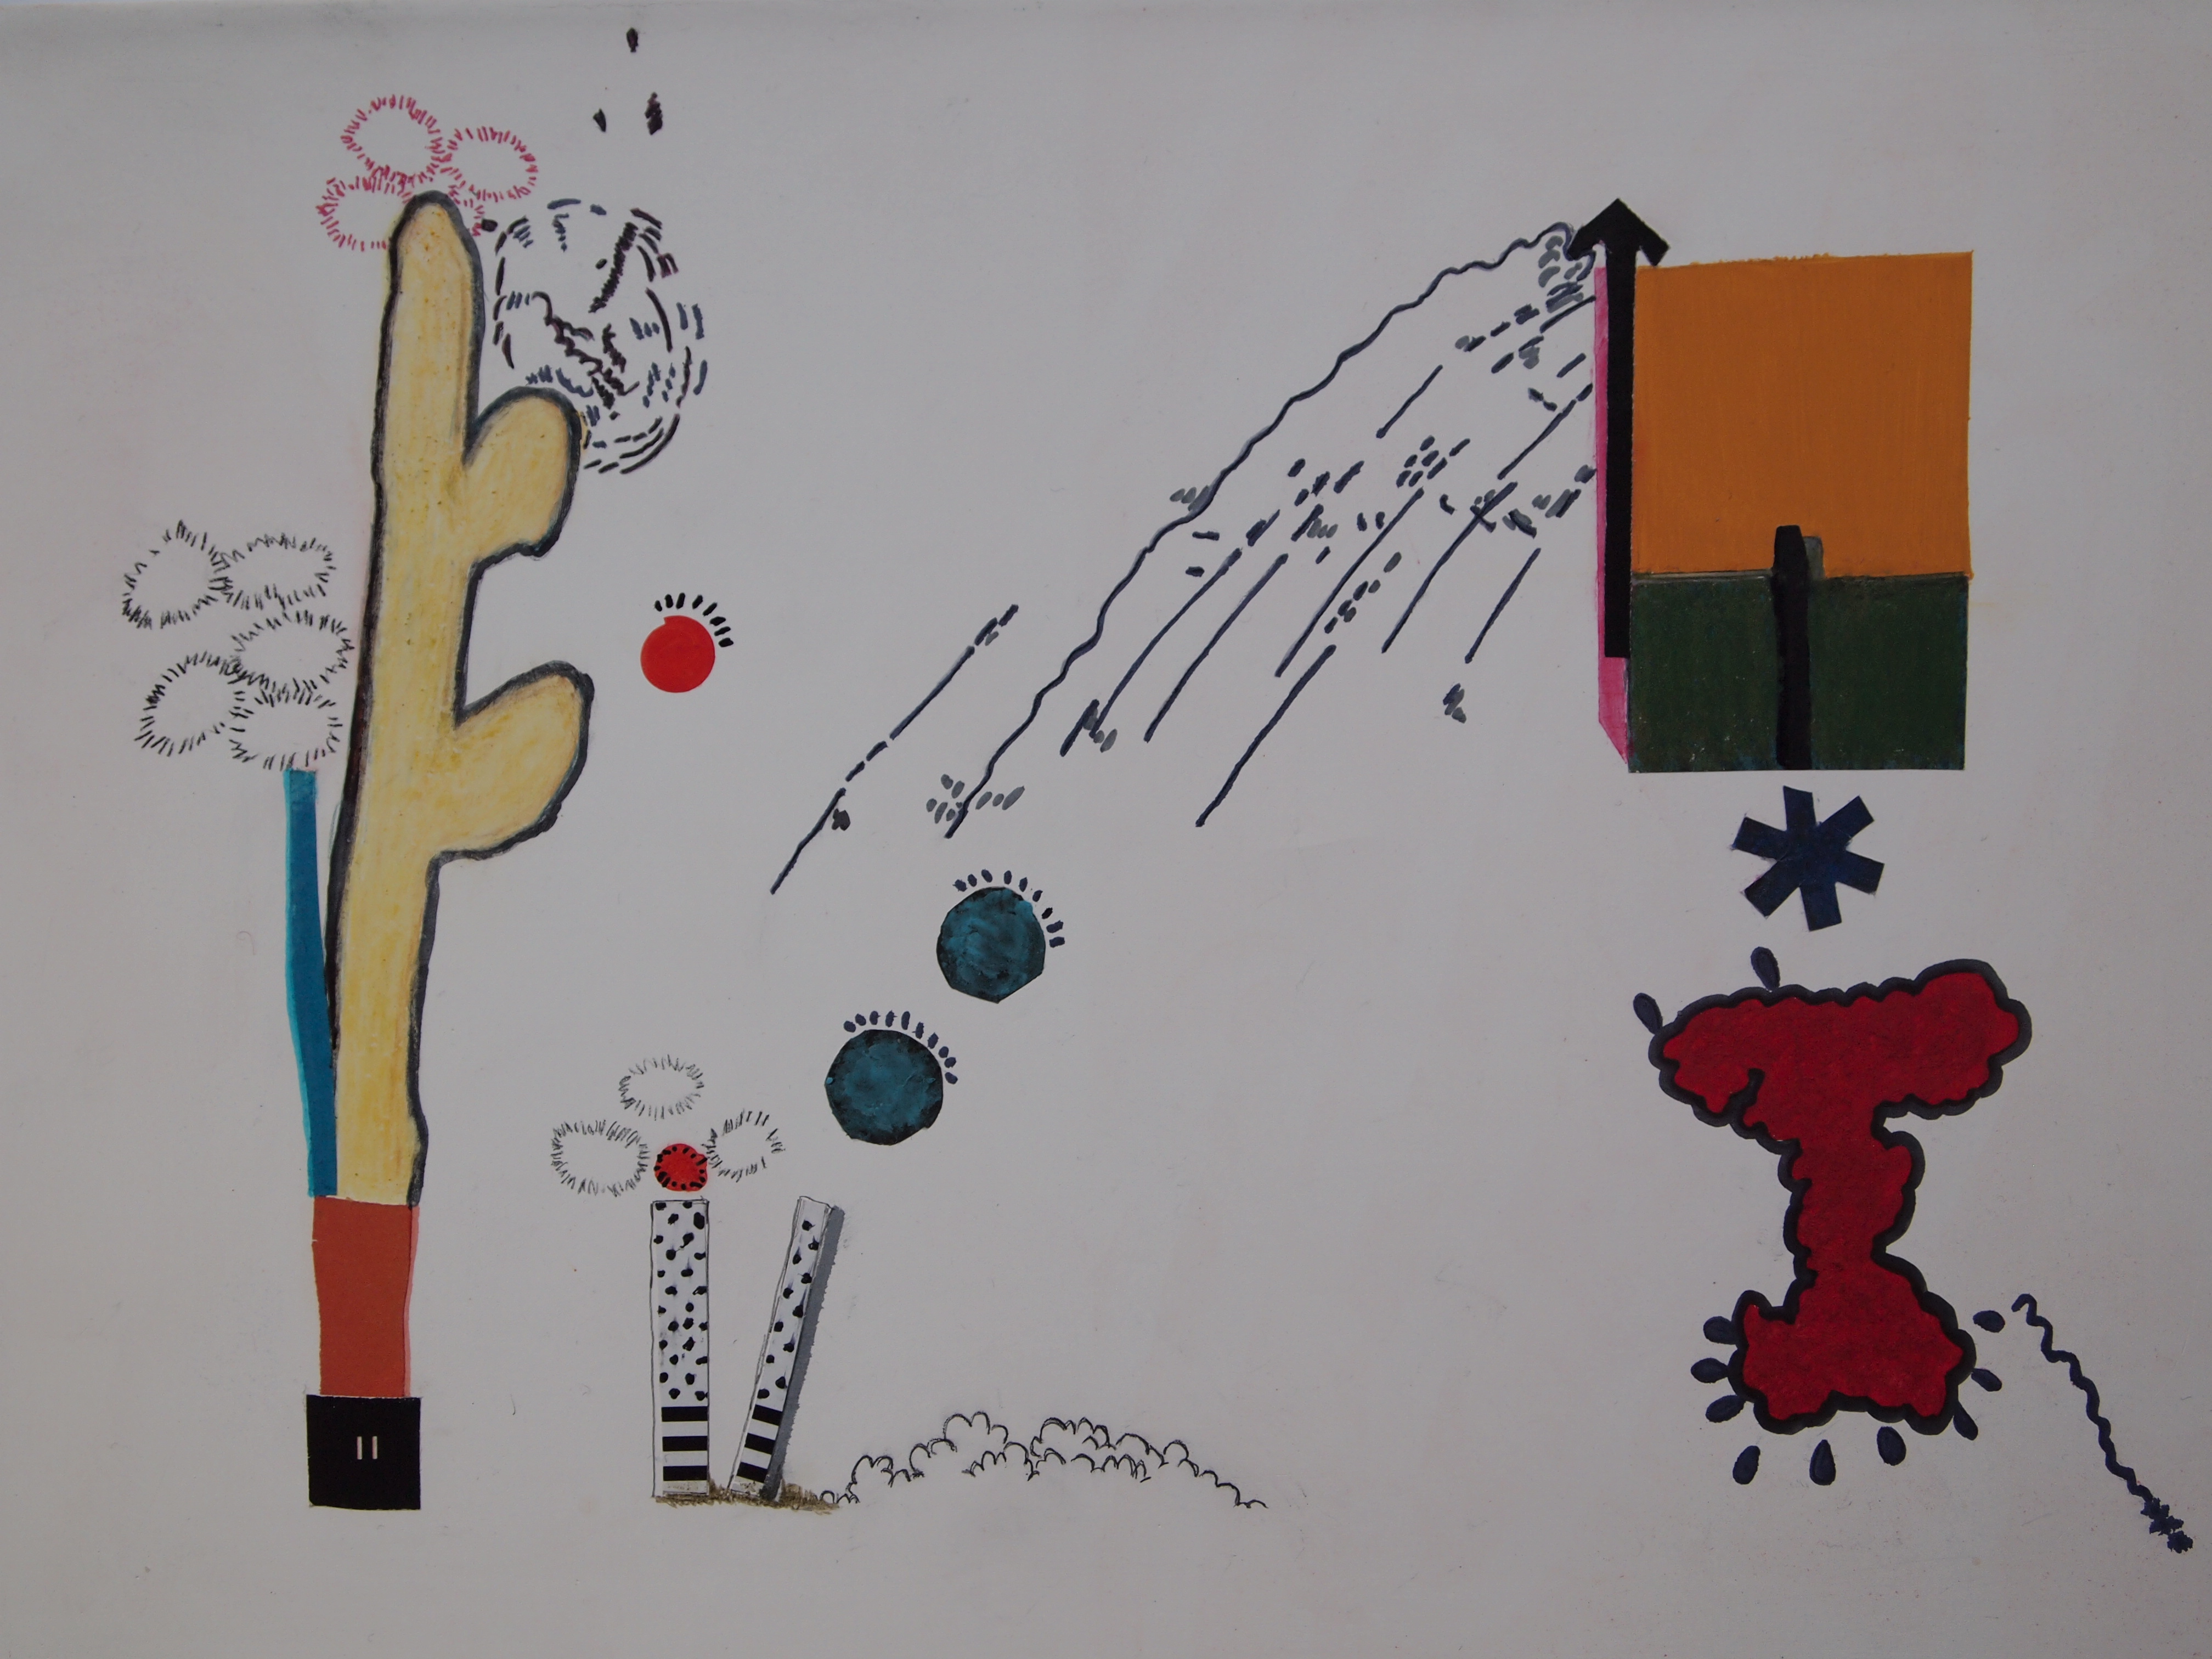 Eirini Boukla, Untitled, 2018. Ink, pastels, gouache, collage on gesso on canvas. 23x30x3,5